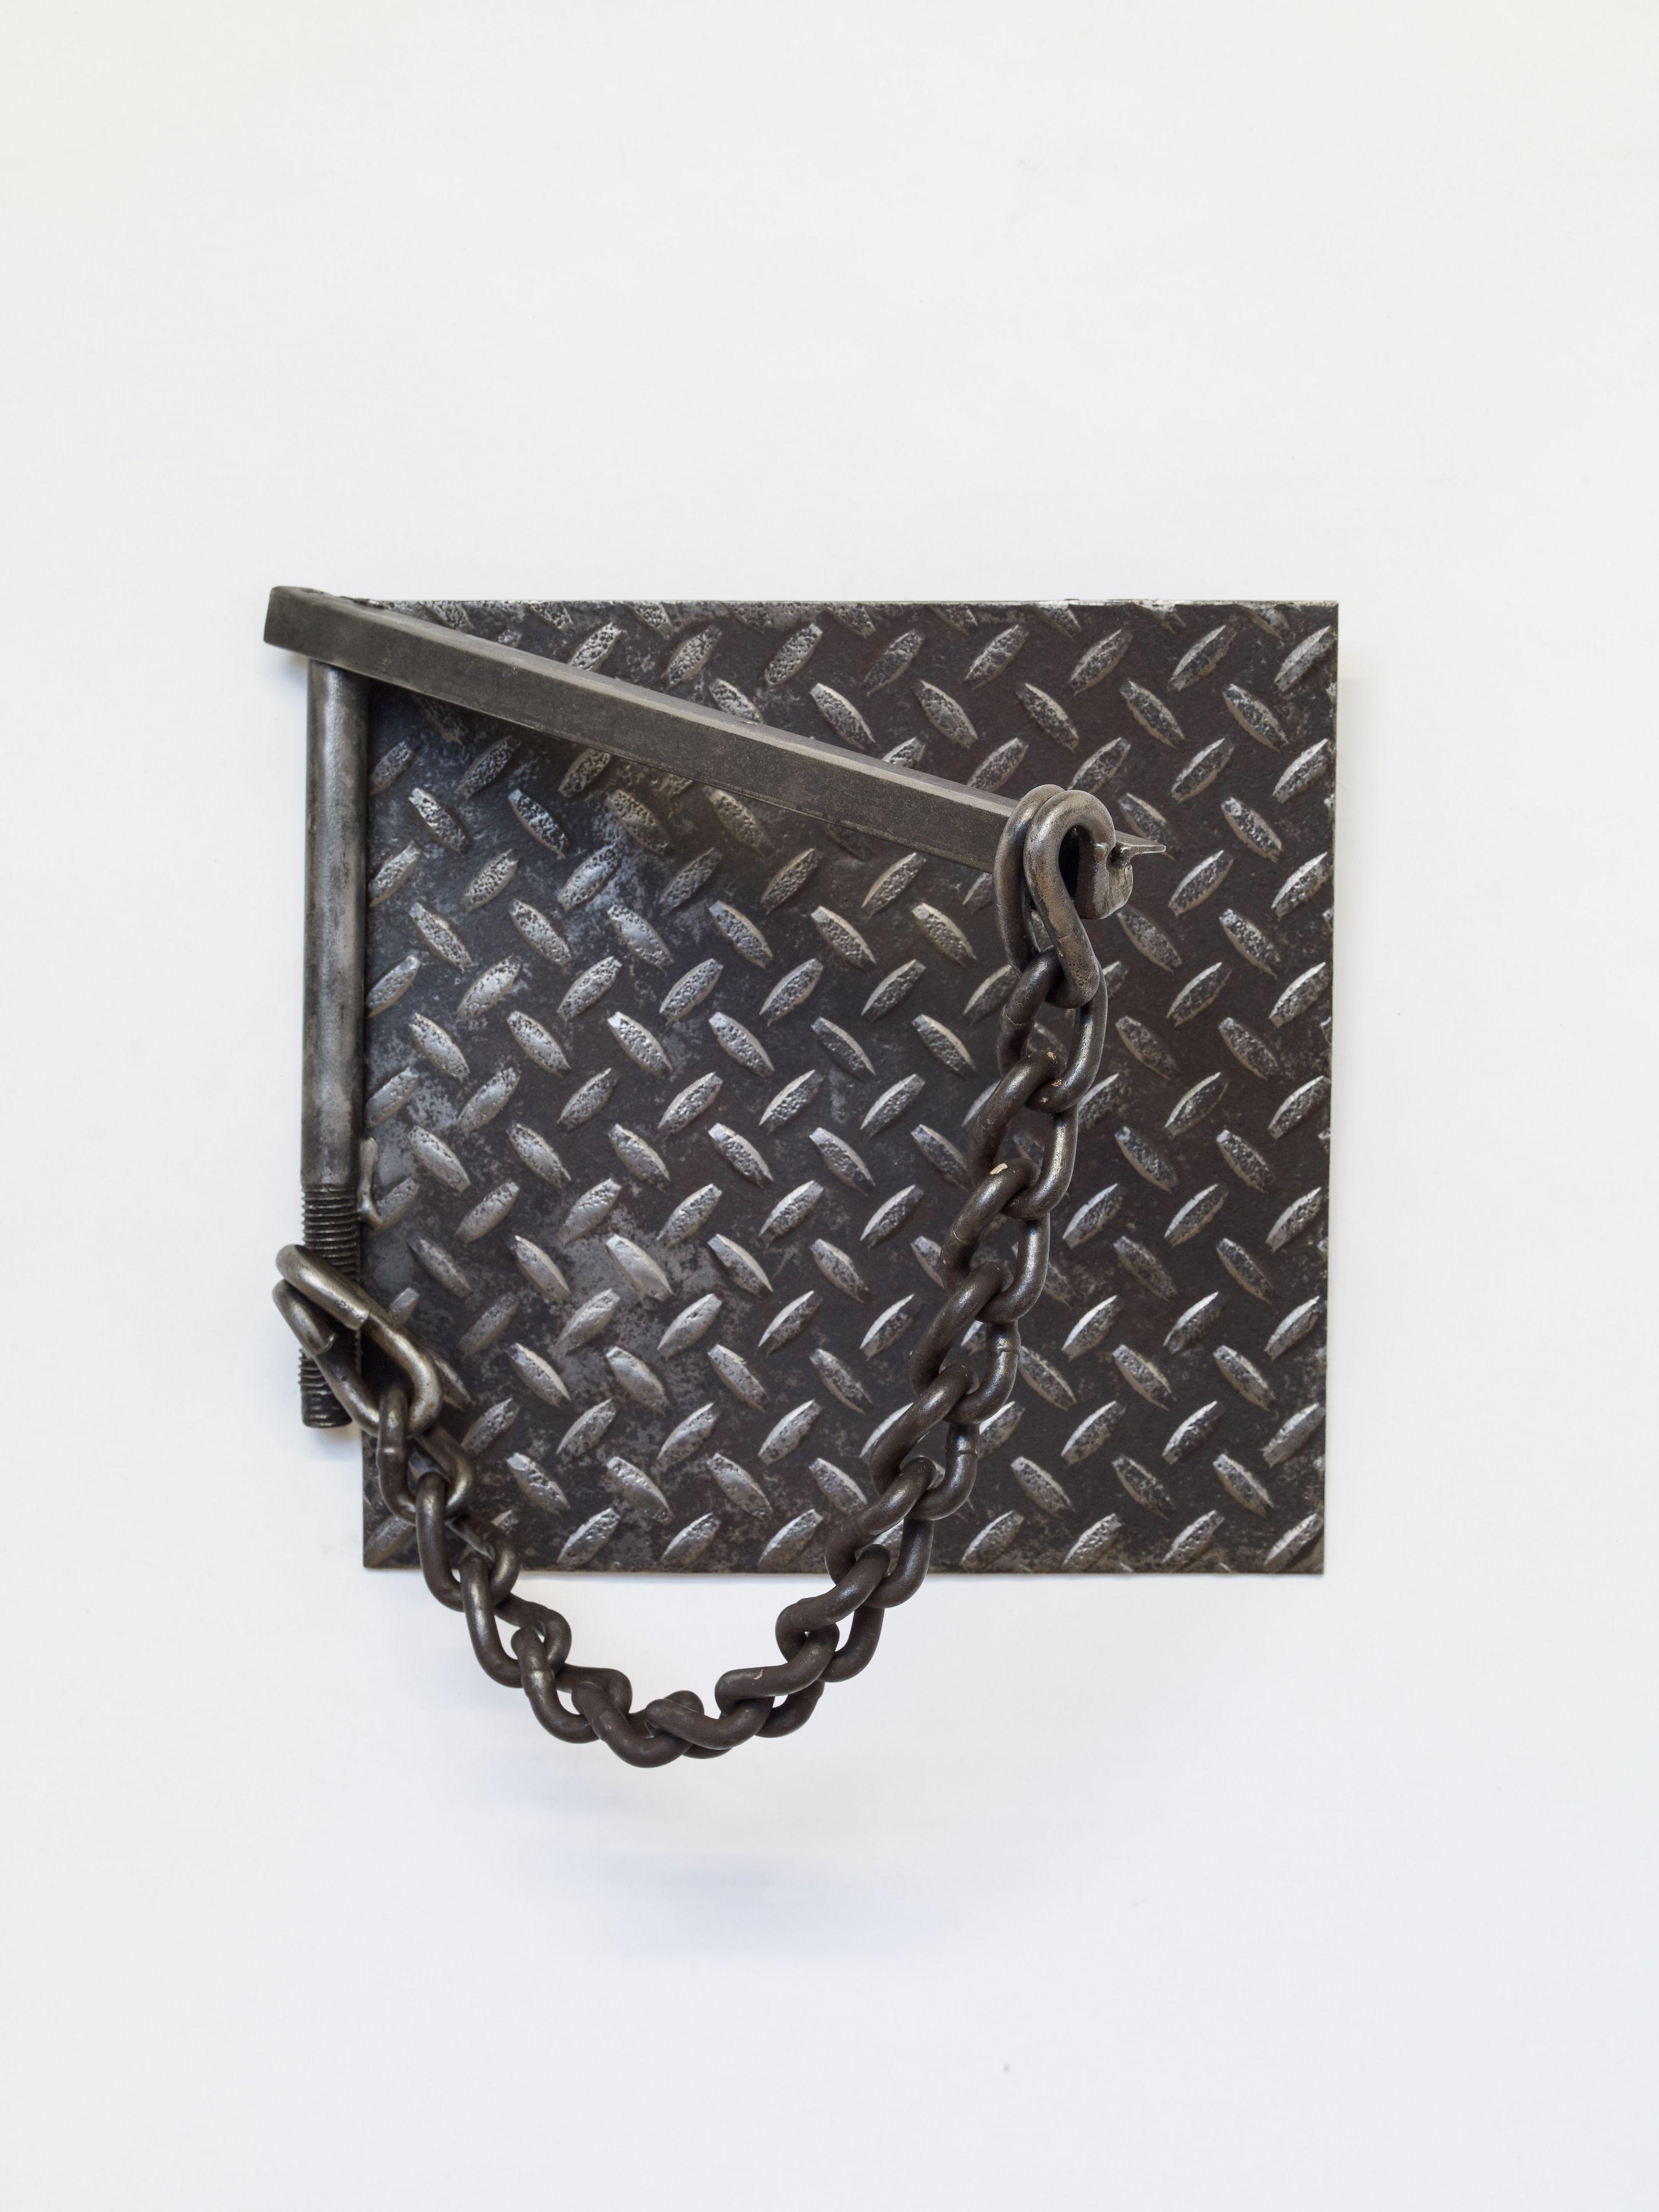 Chain and Diamond, 1979, Welded steel